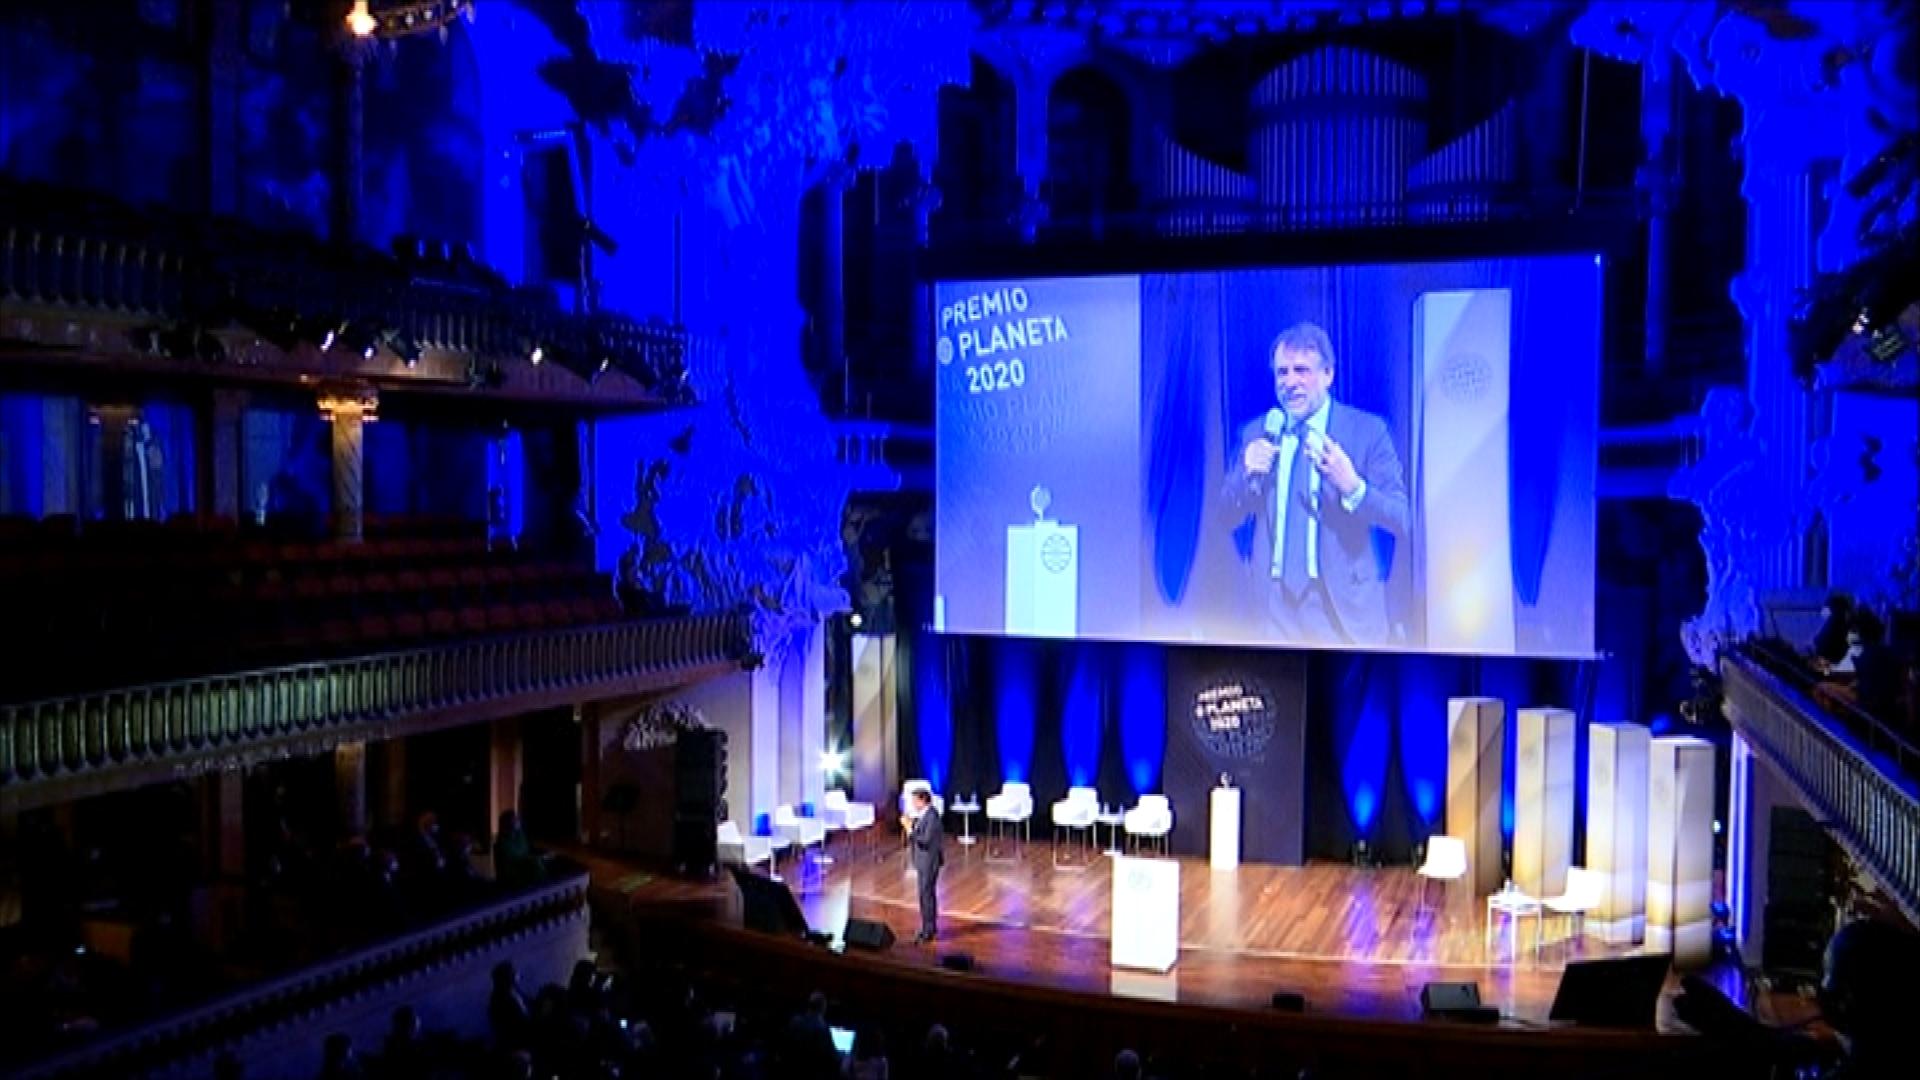 Imatge de la darrera edidicó del Premi Planeta